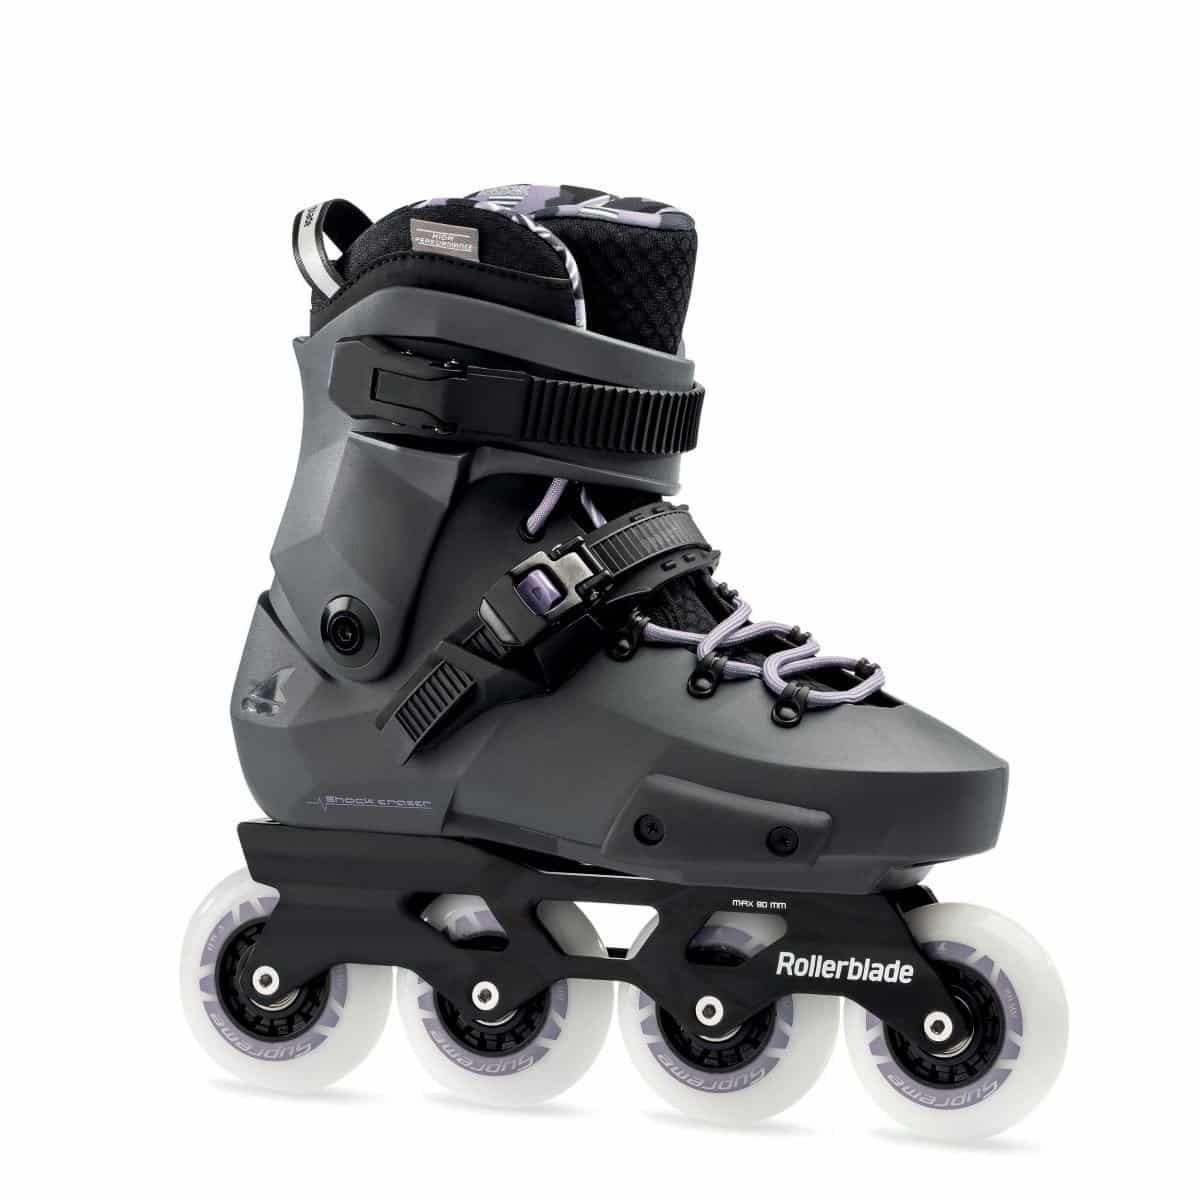 rollerblade twister edge w 2020